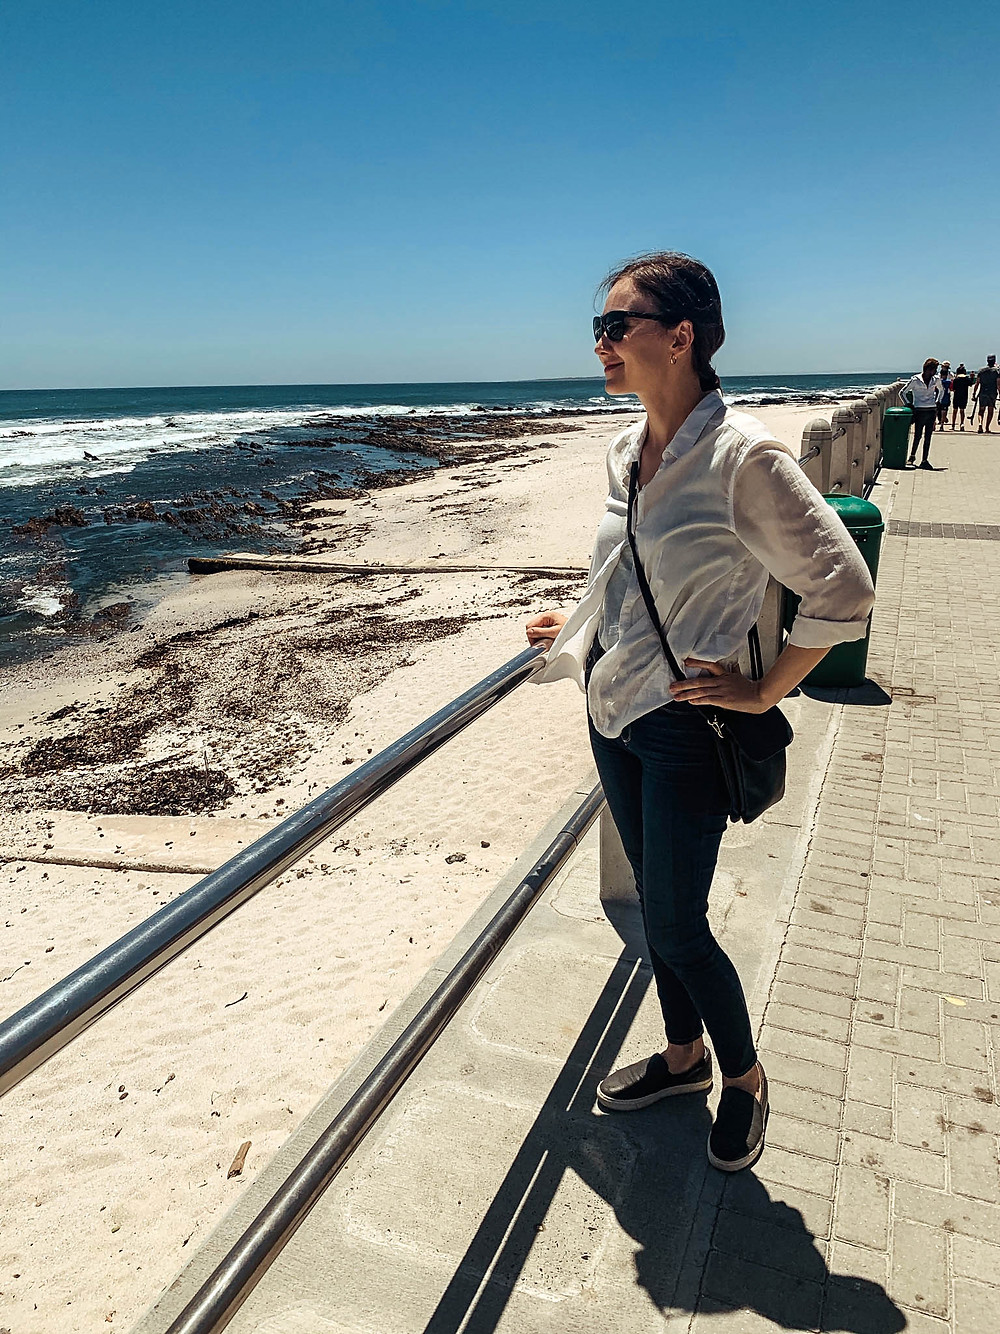 Enjoying the Sea Point Promenade - one of Cape Town's best walks!